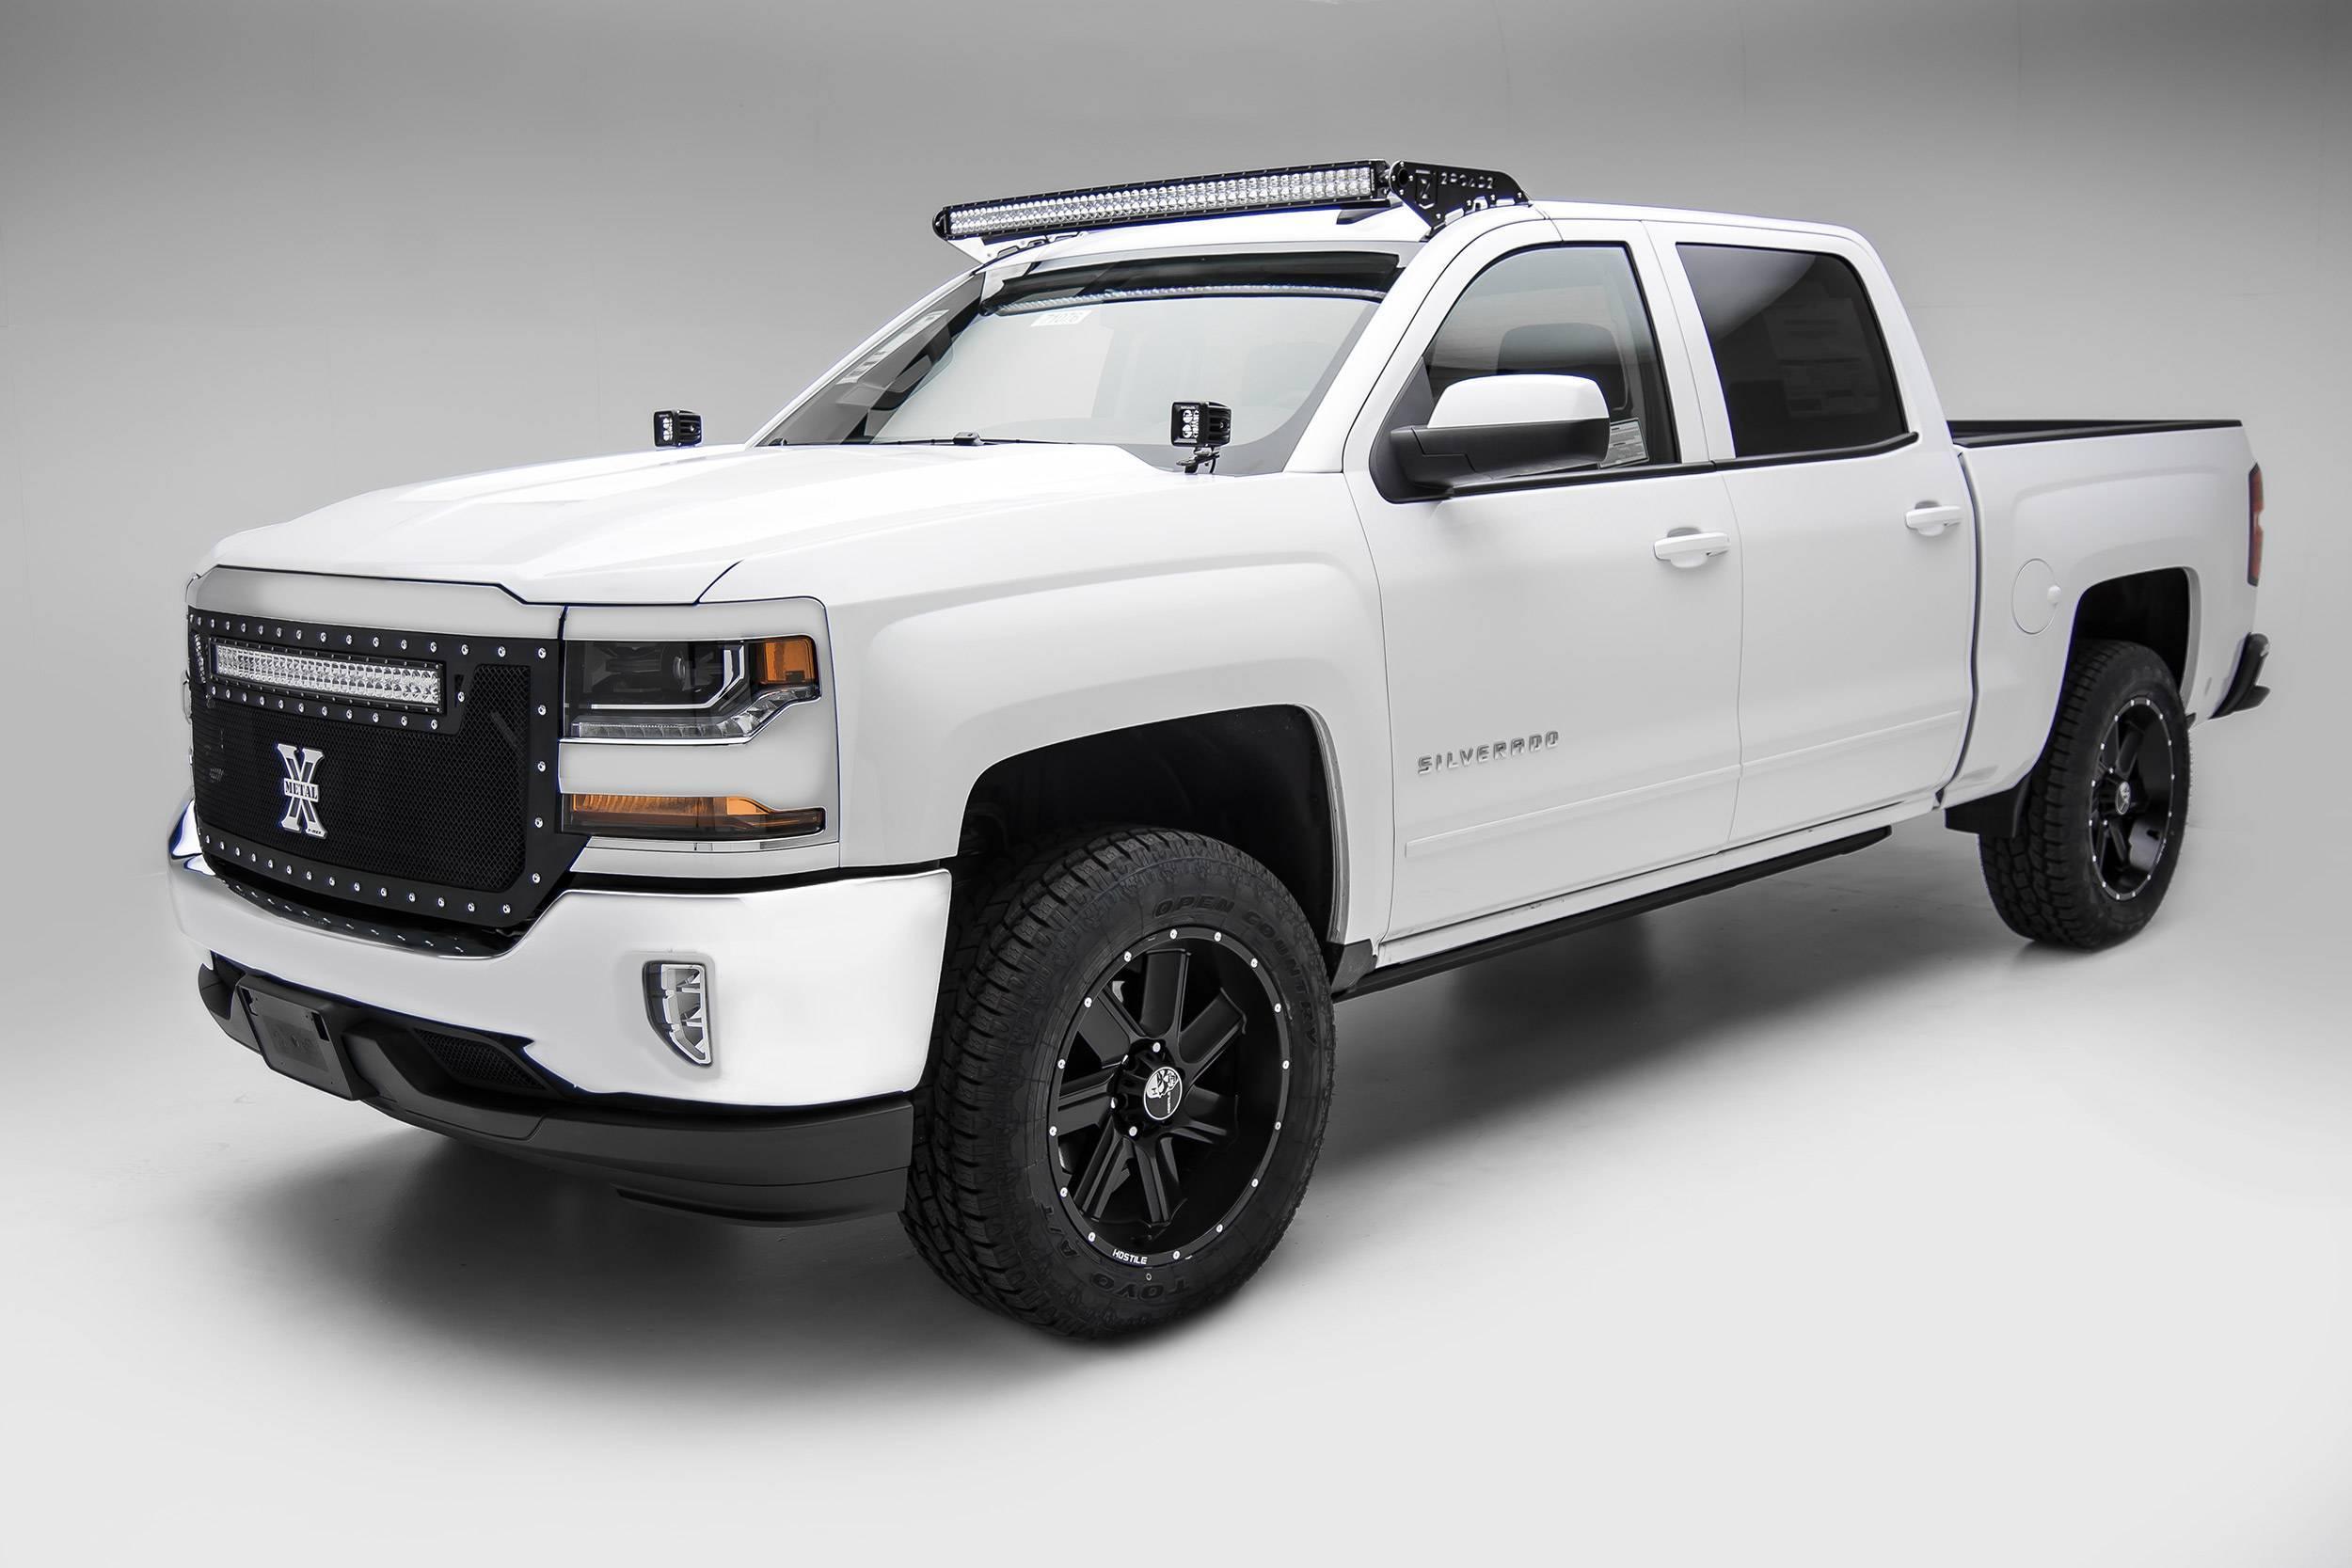 ZROADZ - Silverado, Sierra Front Roof LED Bracket to mount (1) 50 Inch Curved LED Light Bar - PN #Z332081